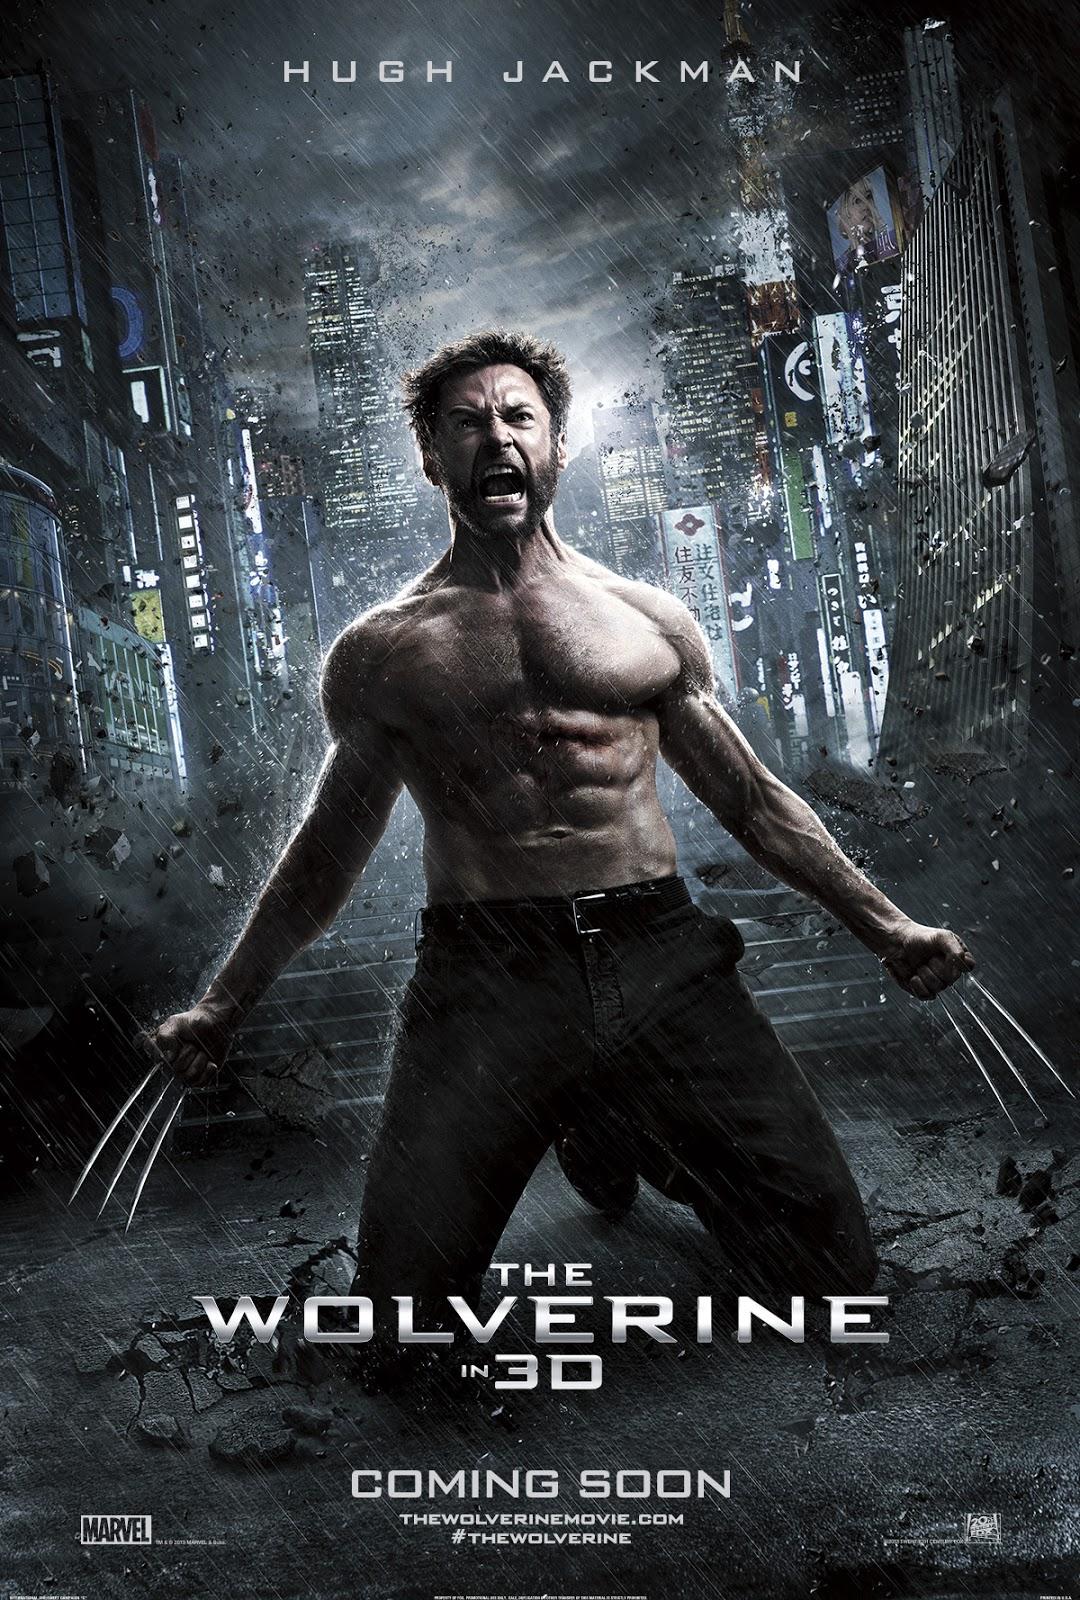 the wolverine 2013 full movie watch online free hd watch